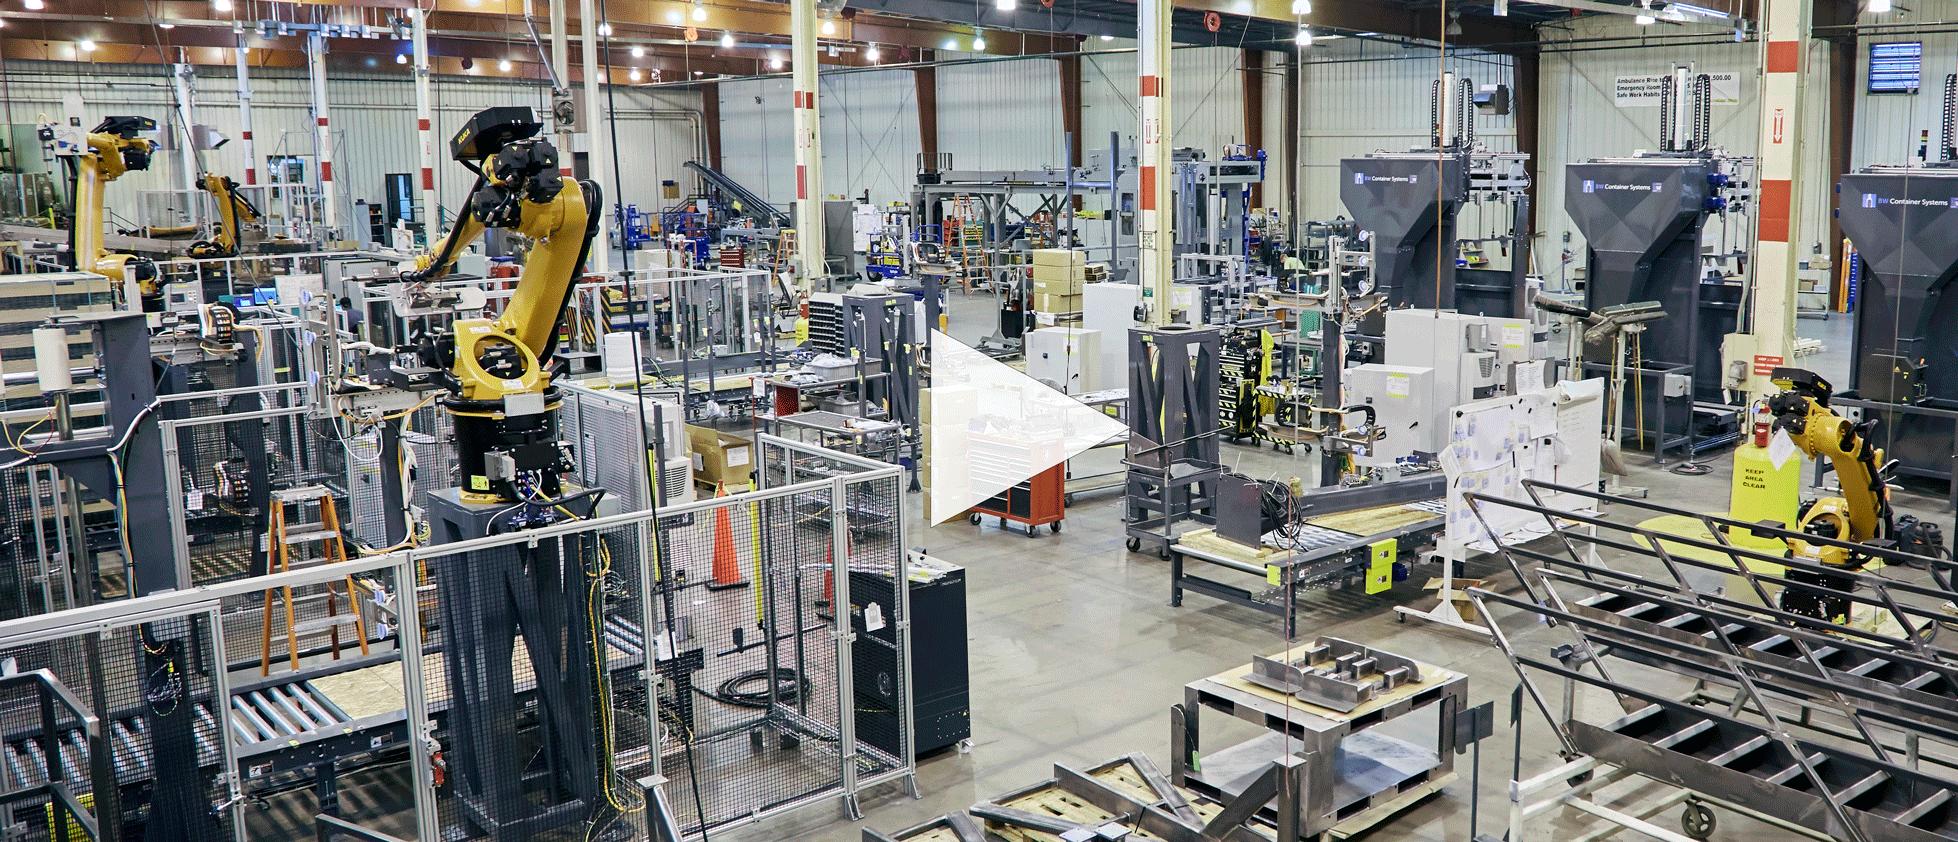 Loveland Manufacturing Floor